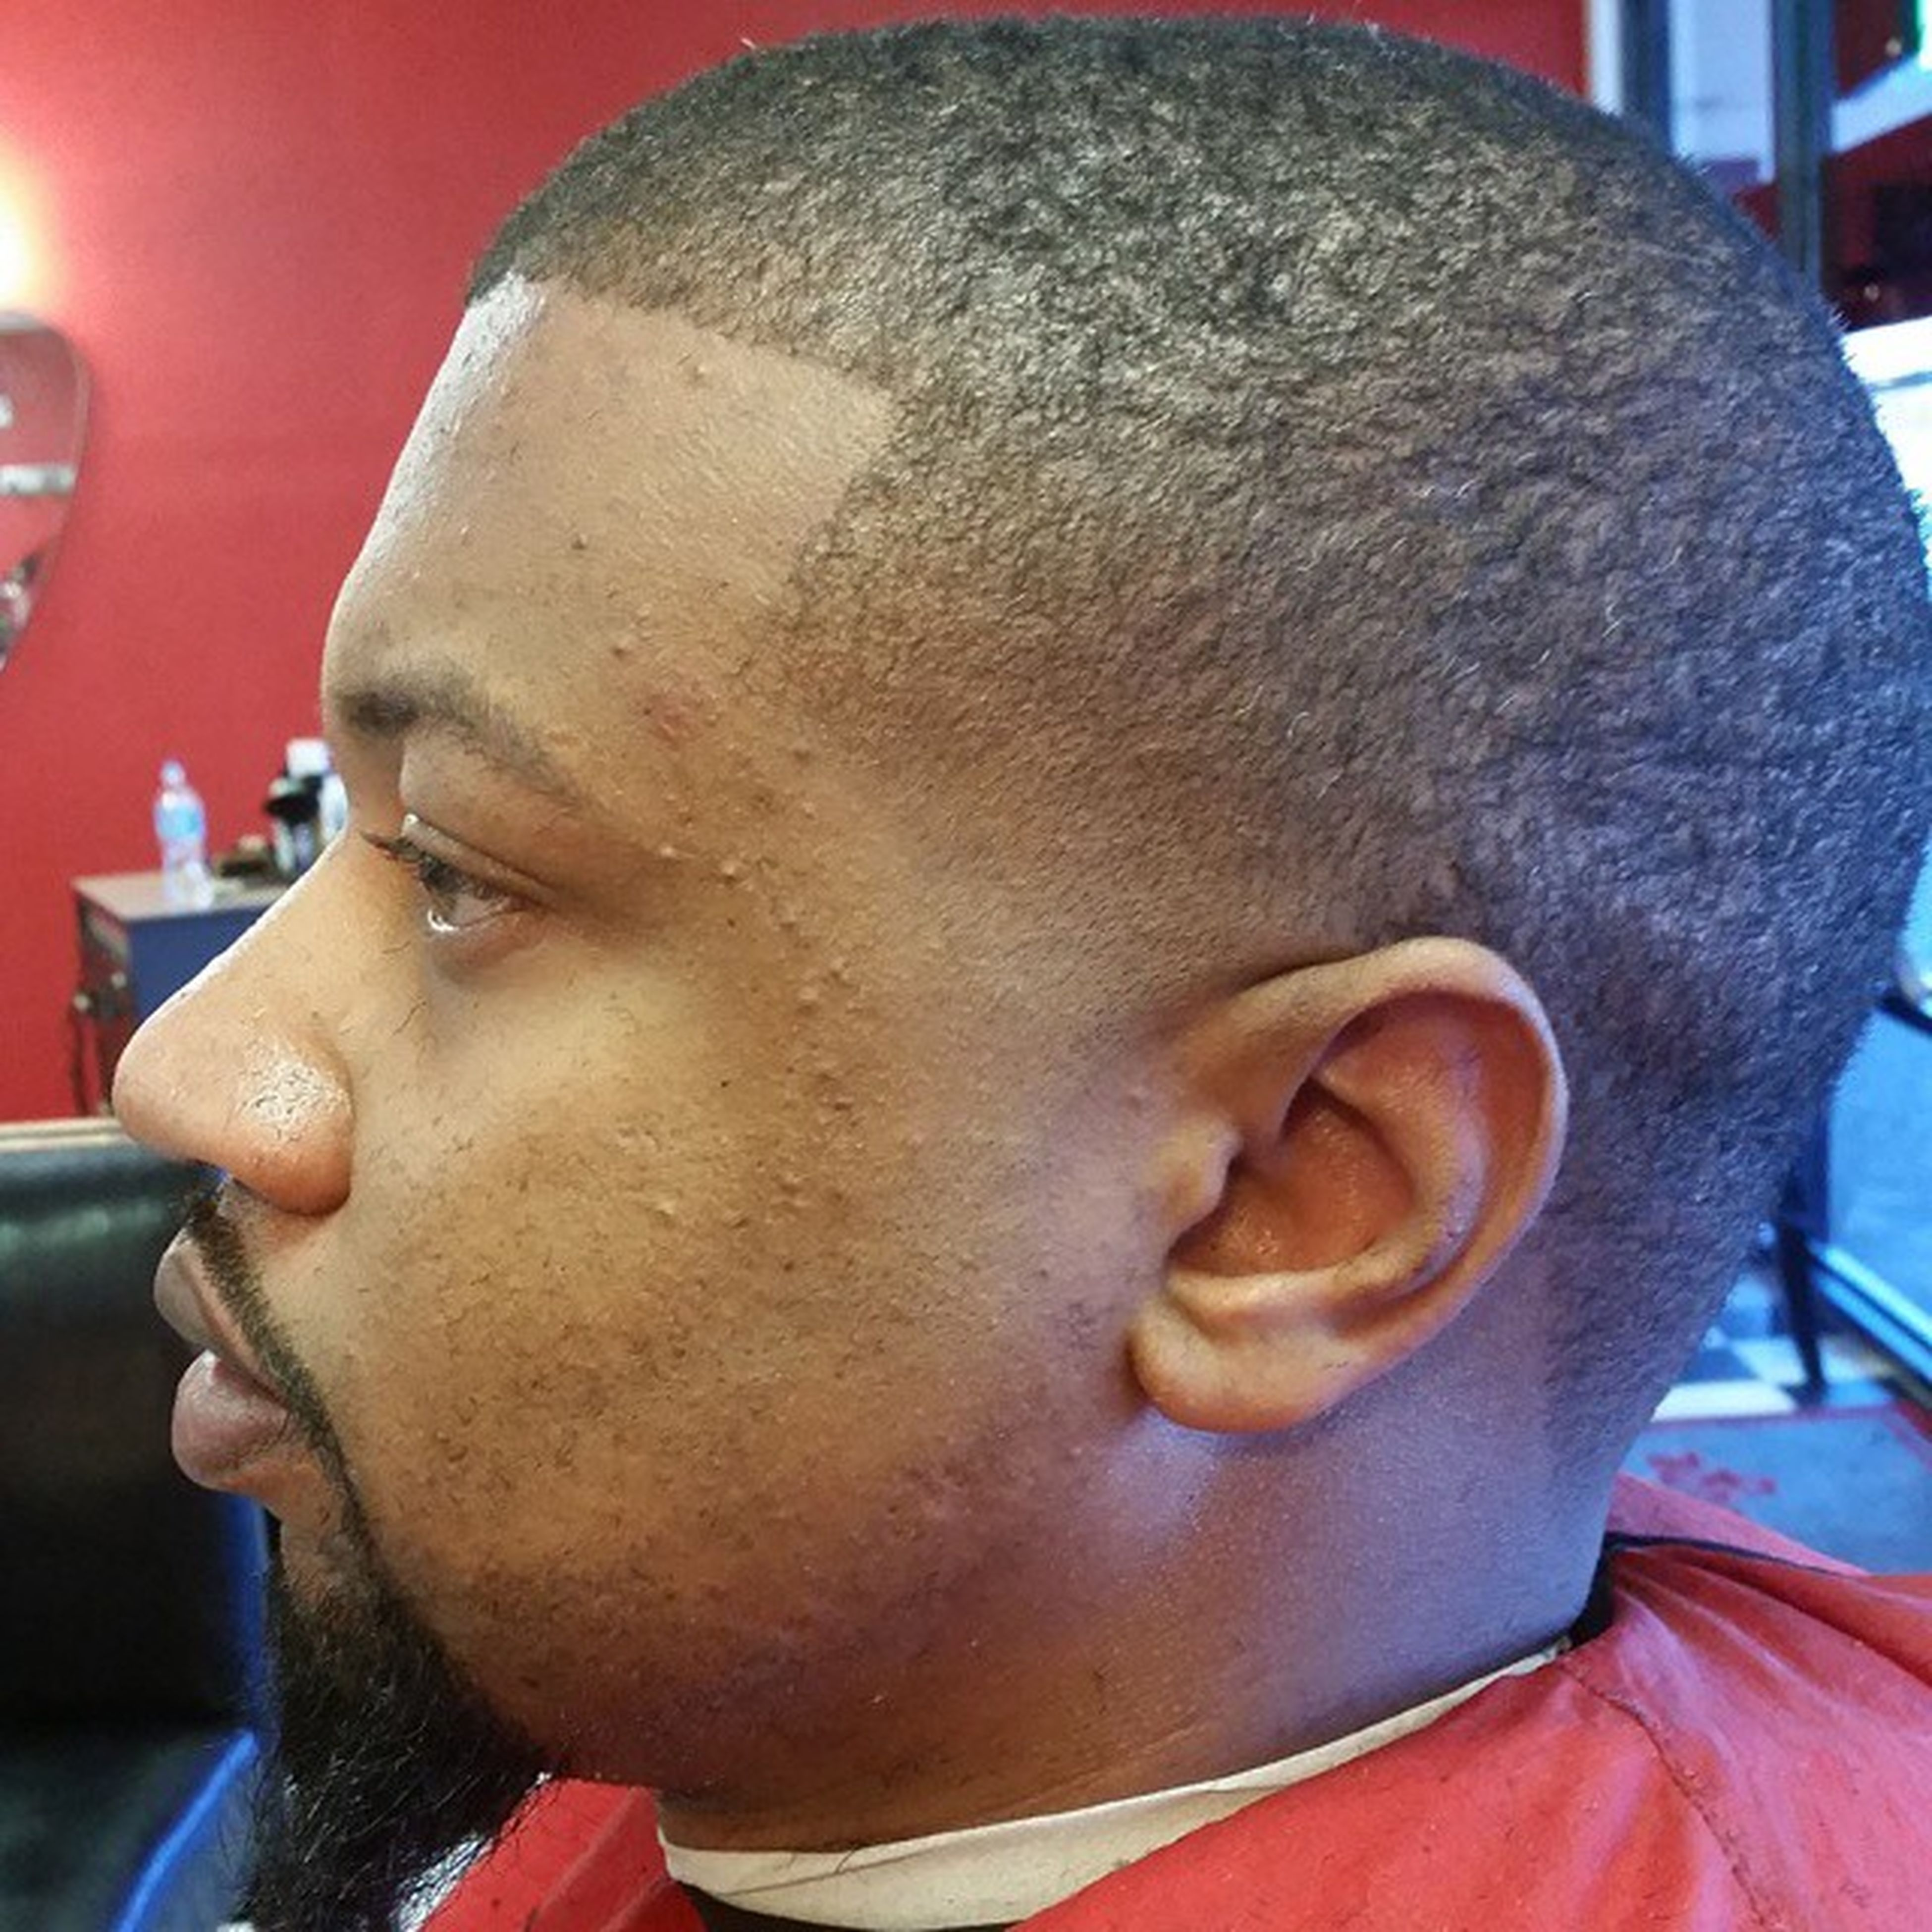 Barber Barberlife Barbershop Barbershopconnect Barbersinctv Barbersarehiphop Crooksandbarbers Nbahaircuts Southernbarberconference Barbersince98 Thebarberpost Andis  Taper  Fade DfwBarber Mensgrooming Menstylehair Haircut Hairnerd Barberswag Freshcut